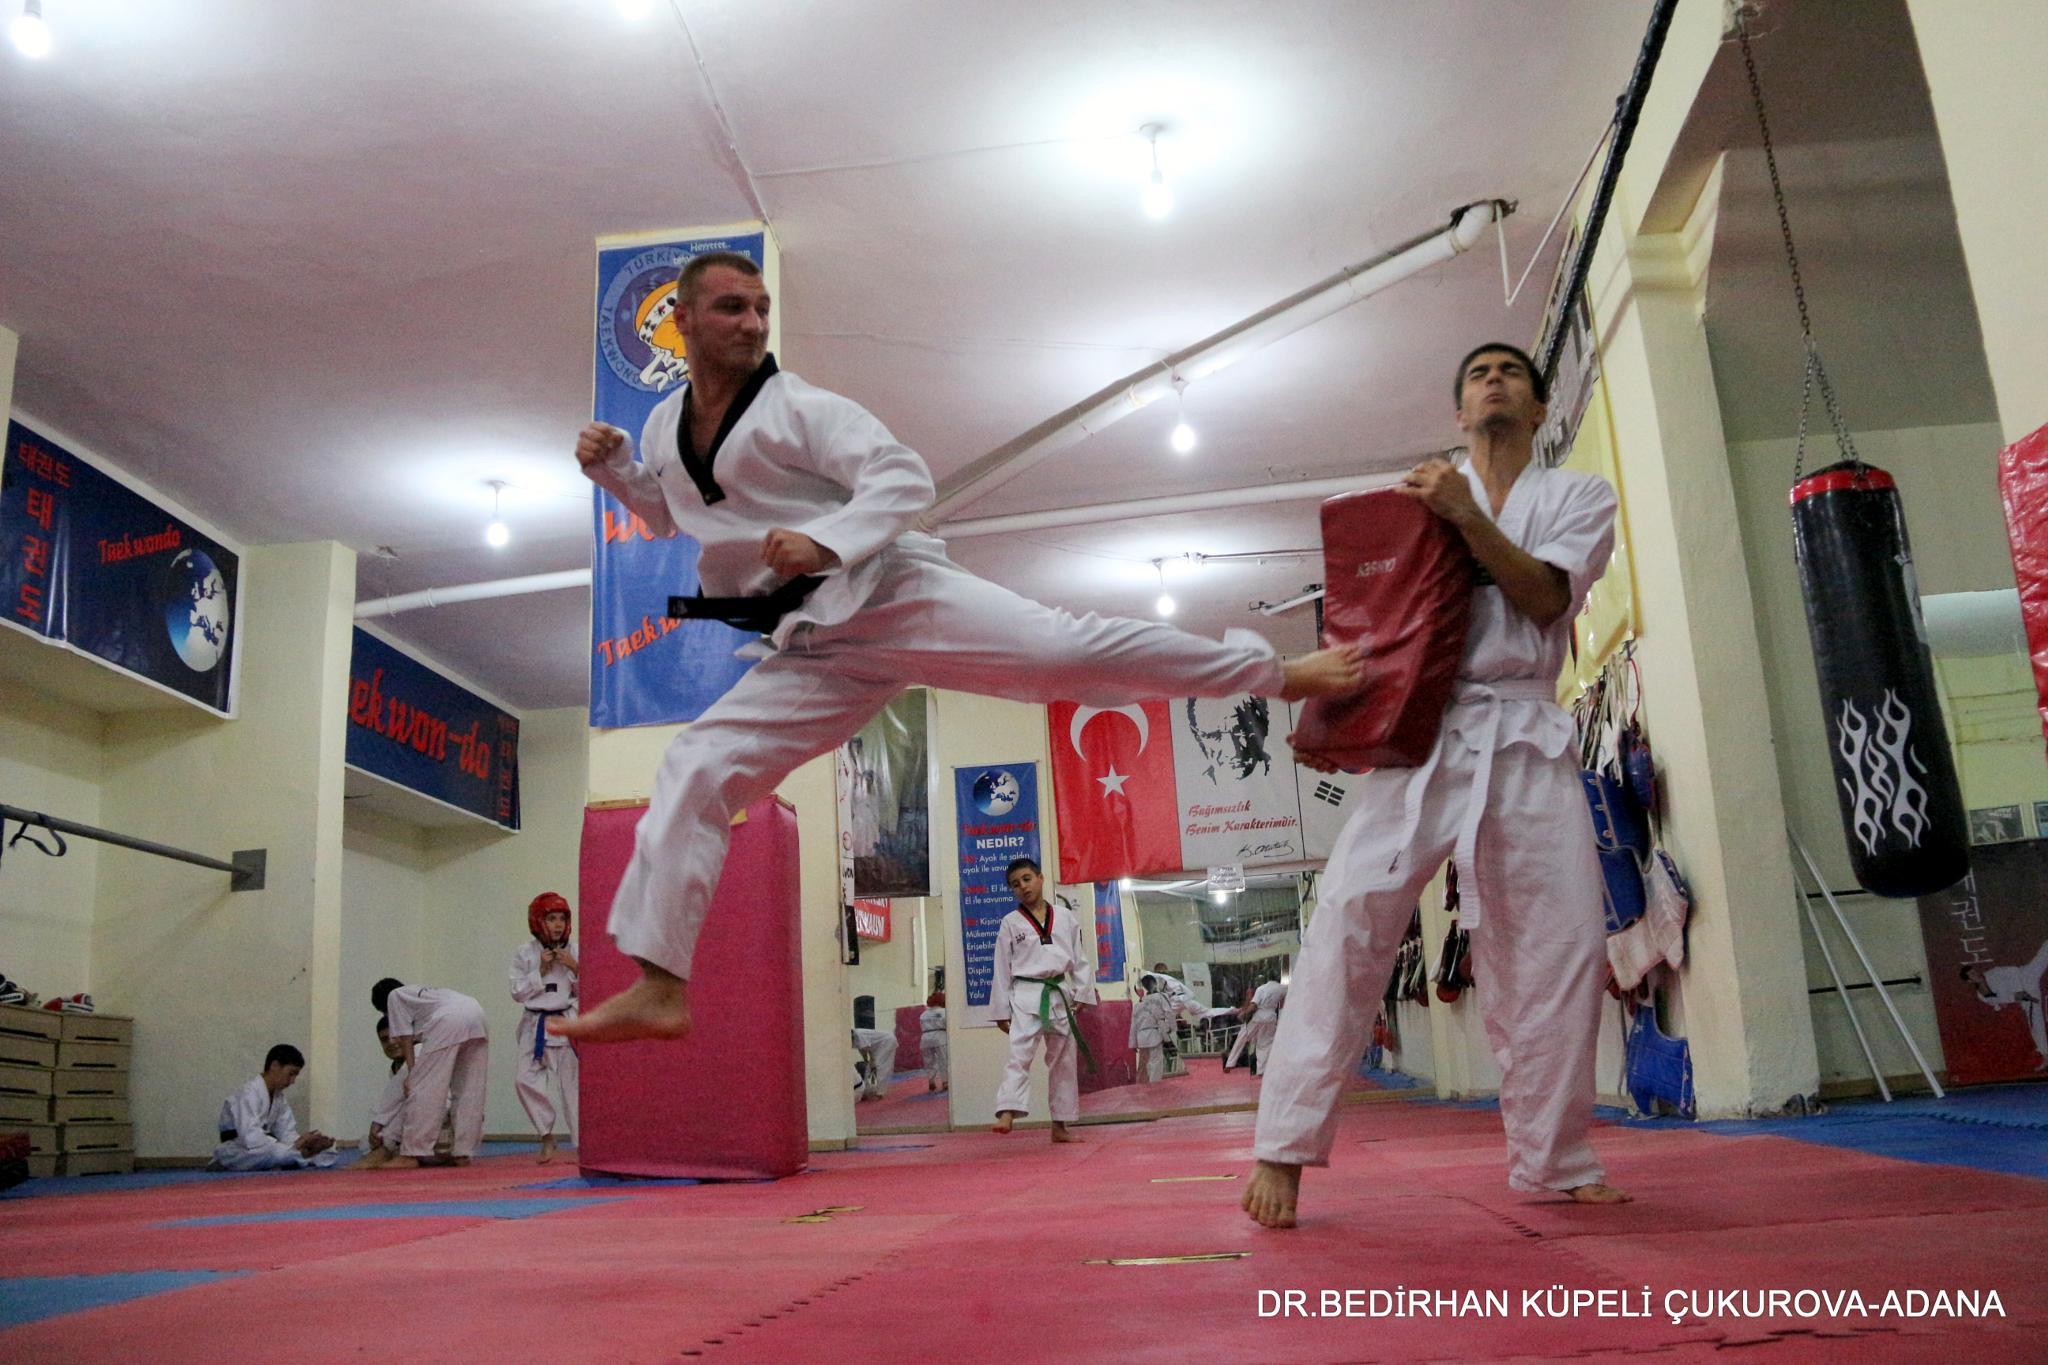 fighter man by Bedirhan Küpeli